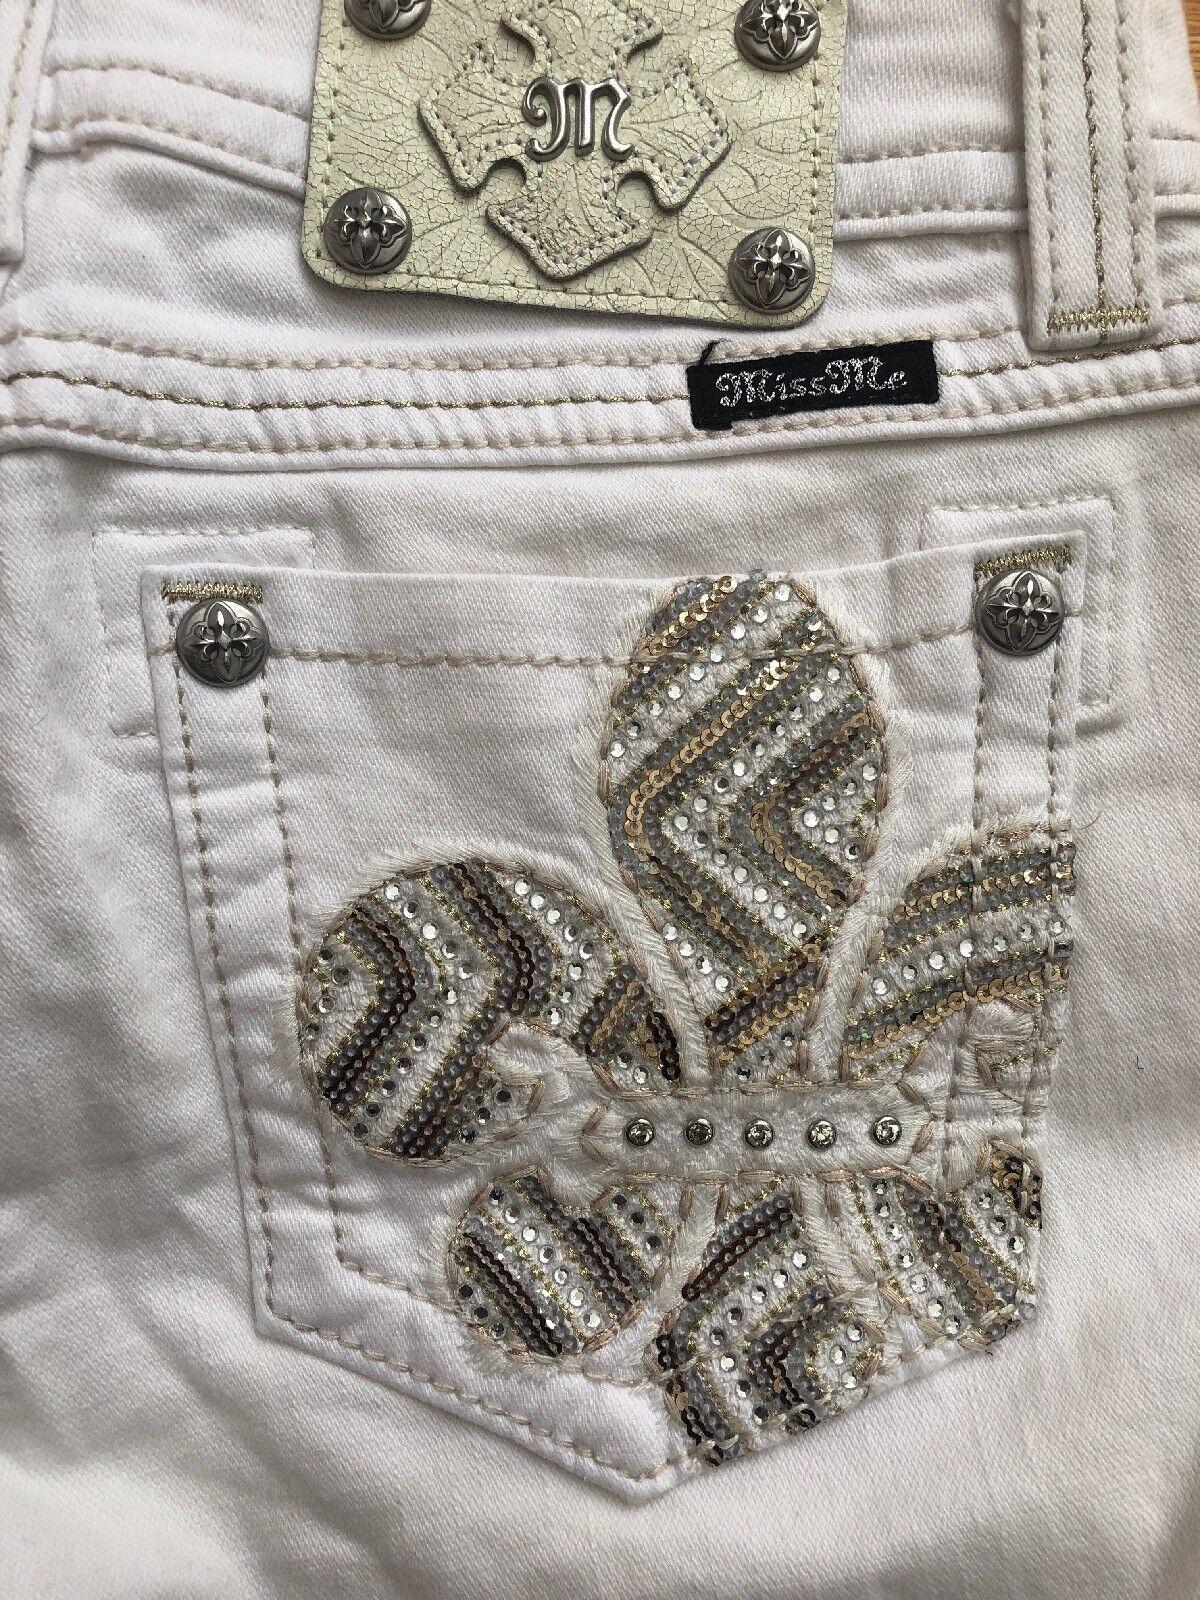 MISS ME White Bling Sequin Fleur De Lis Mid Rise Boot Cut Jeans Womens 30x32 NWT